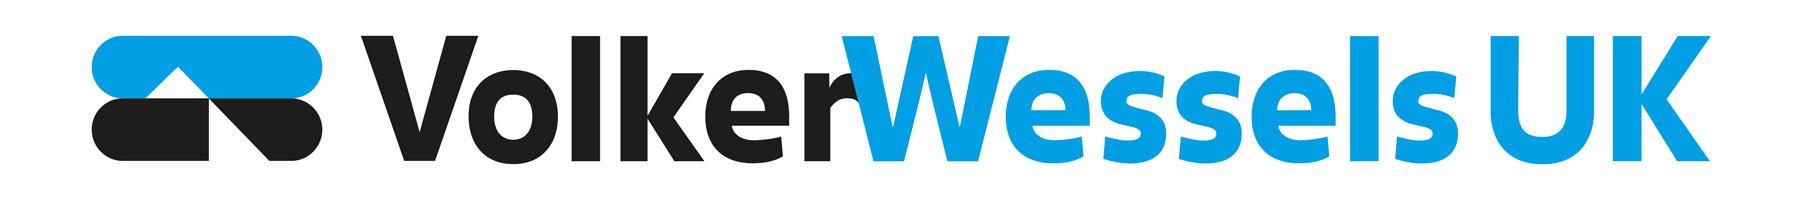 VolkerWesselsUK logo